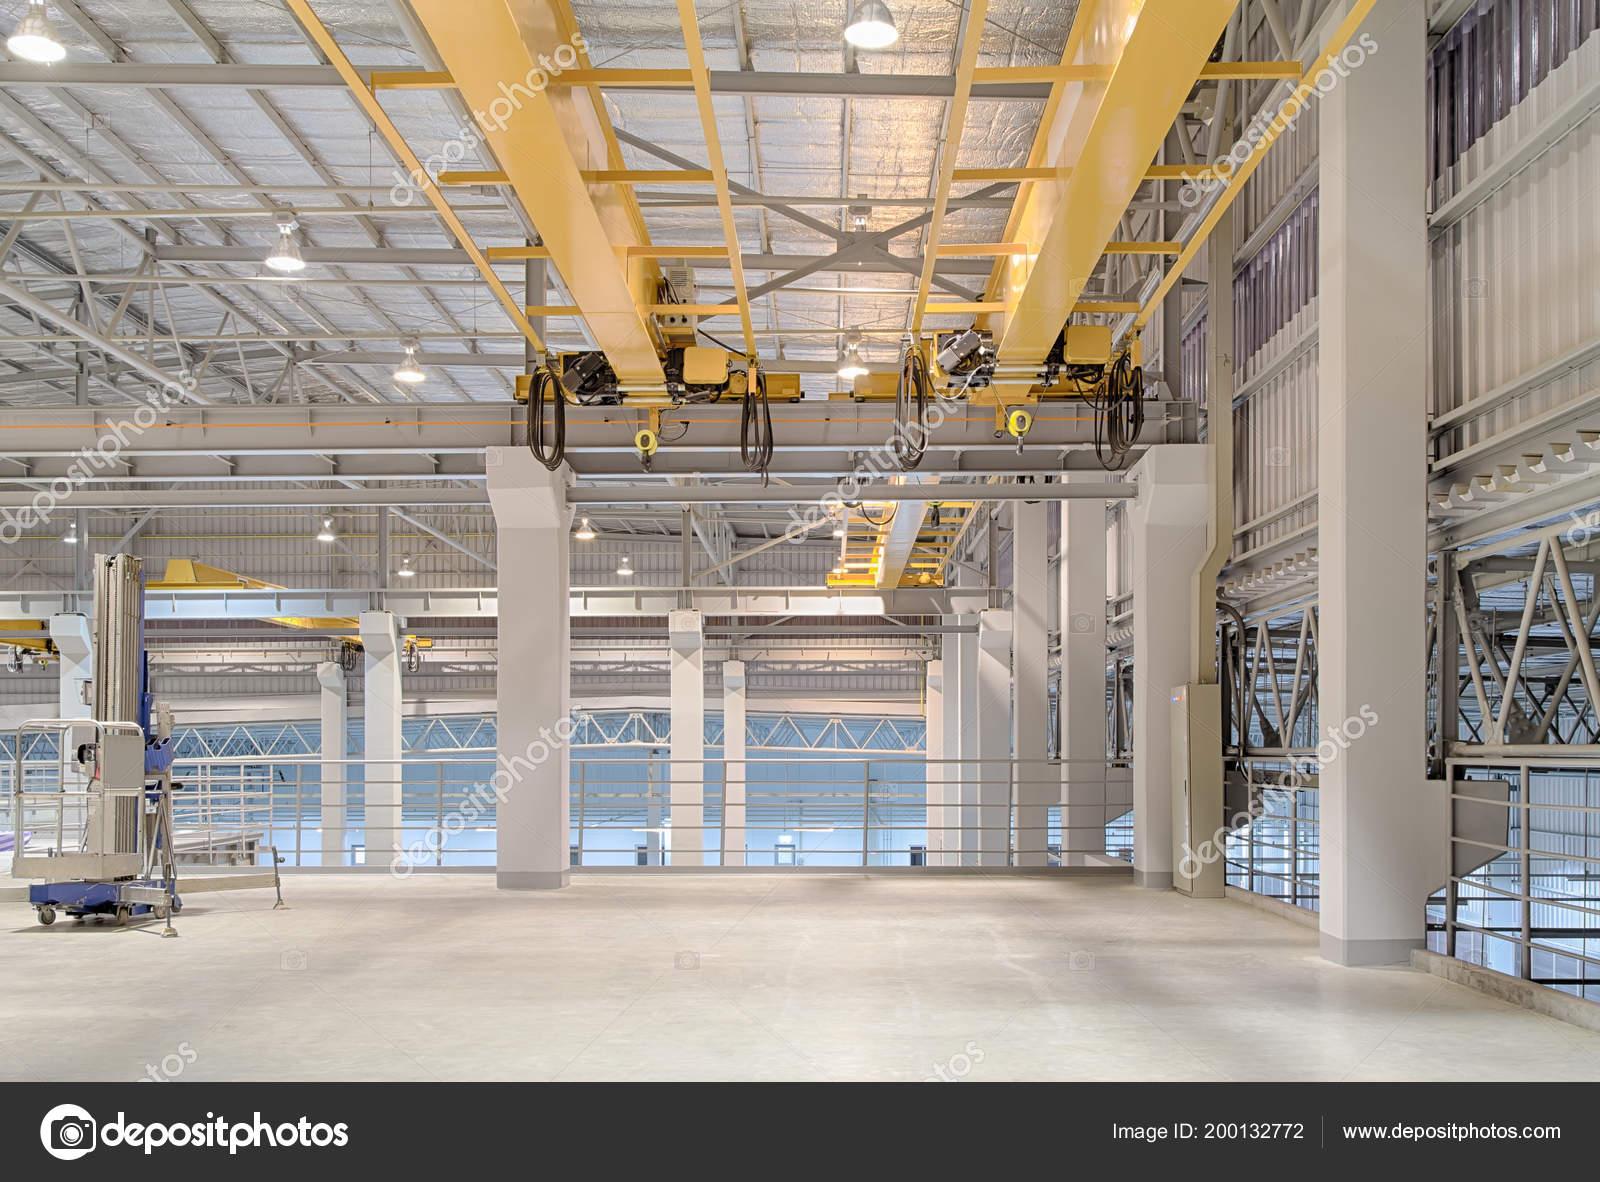 Overhead Crane Concrete Floor Factory Building Background